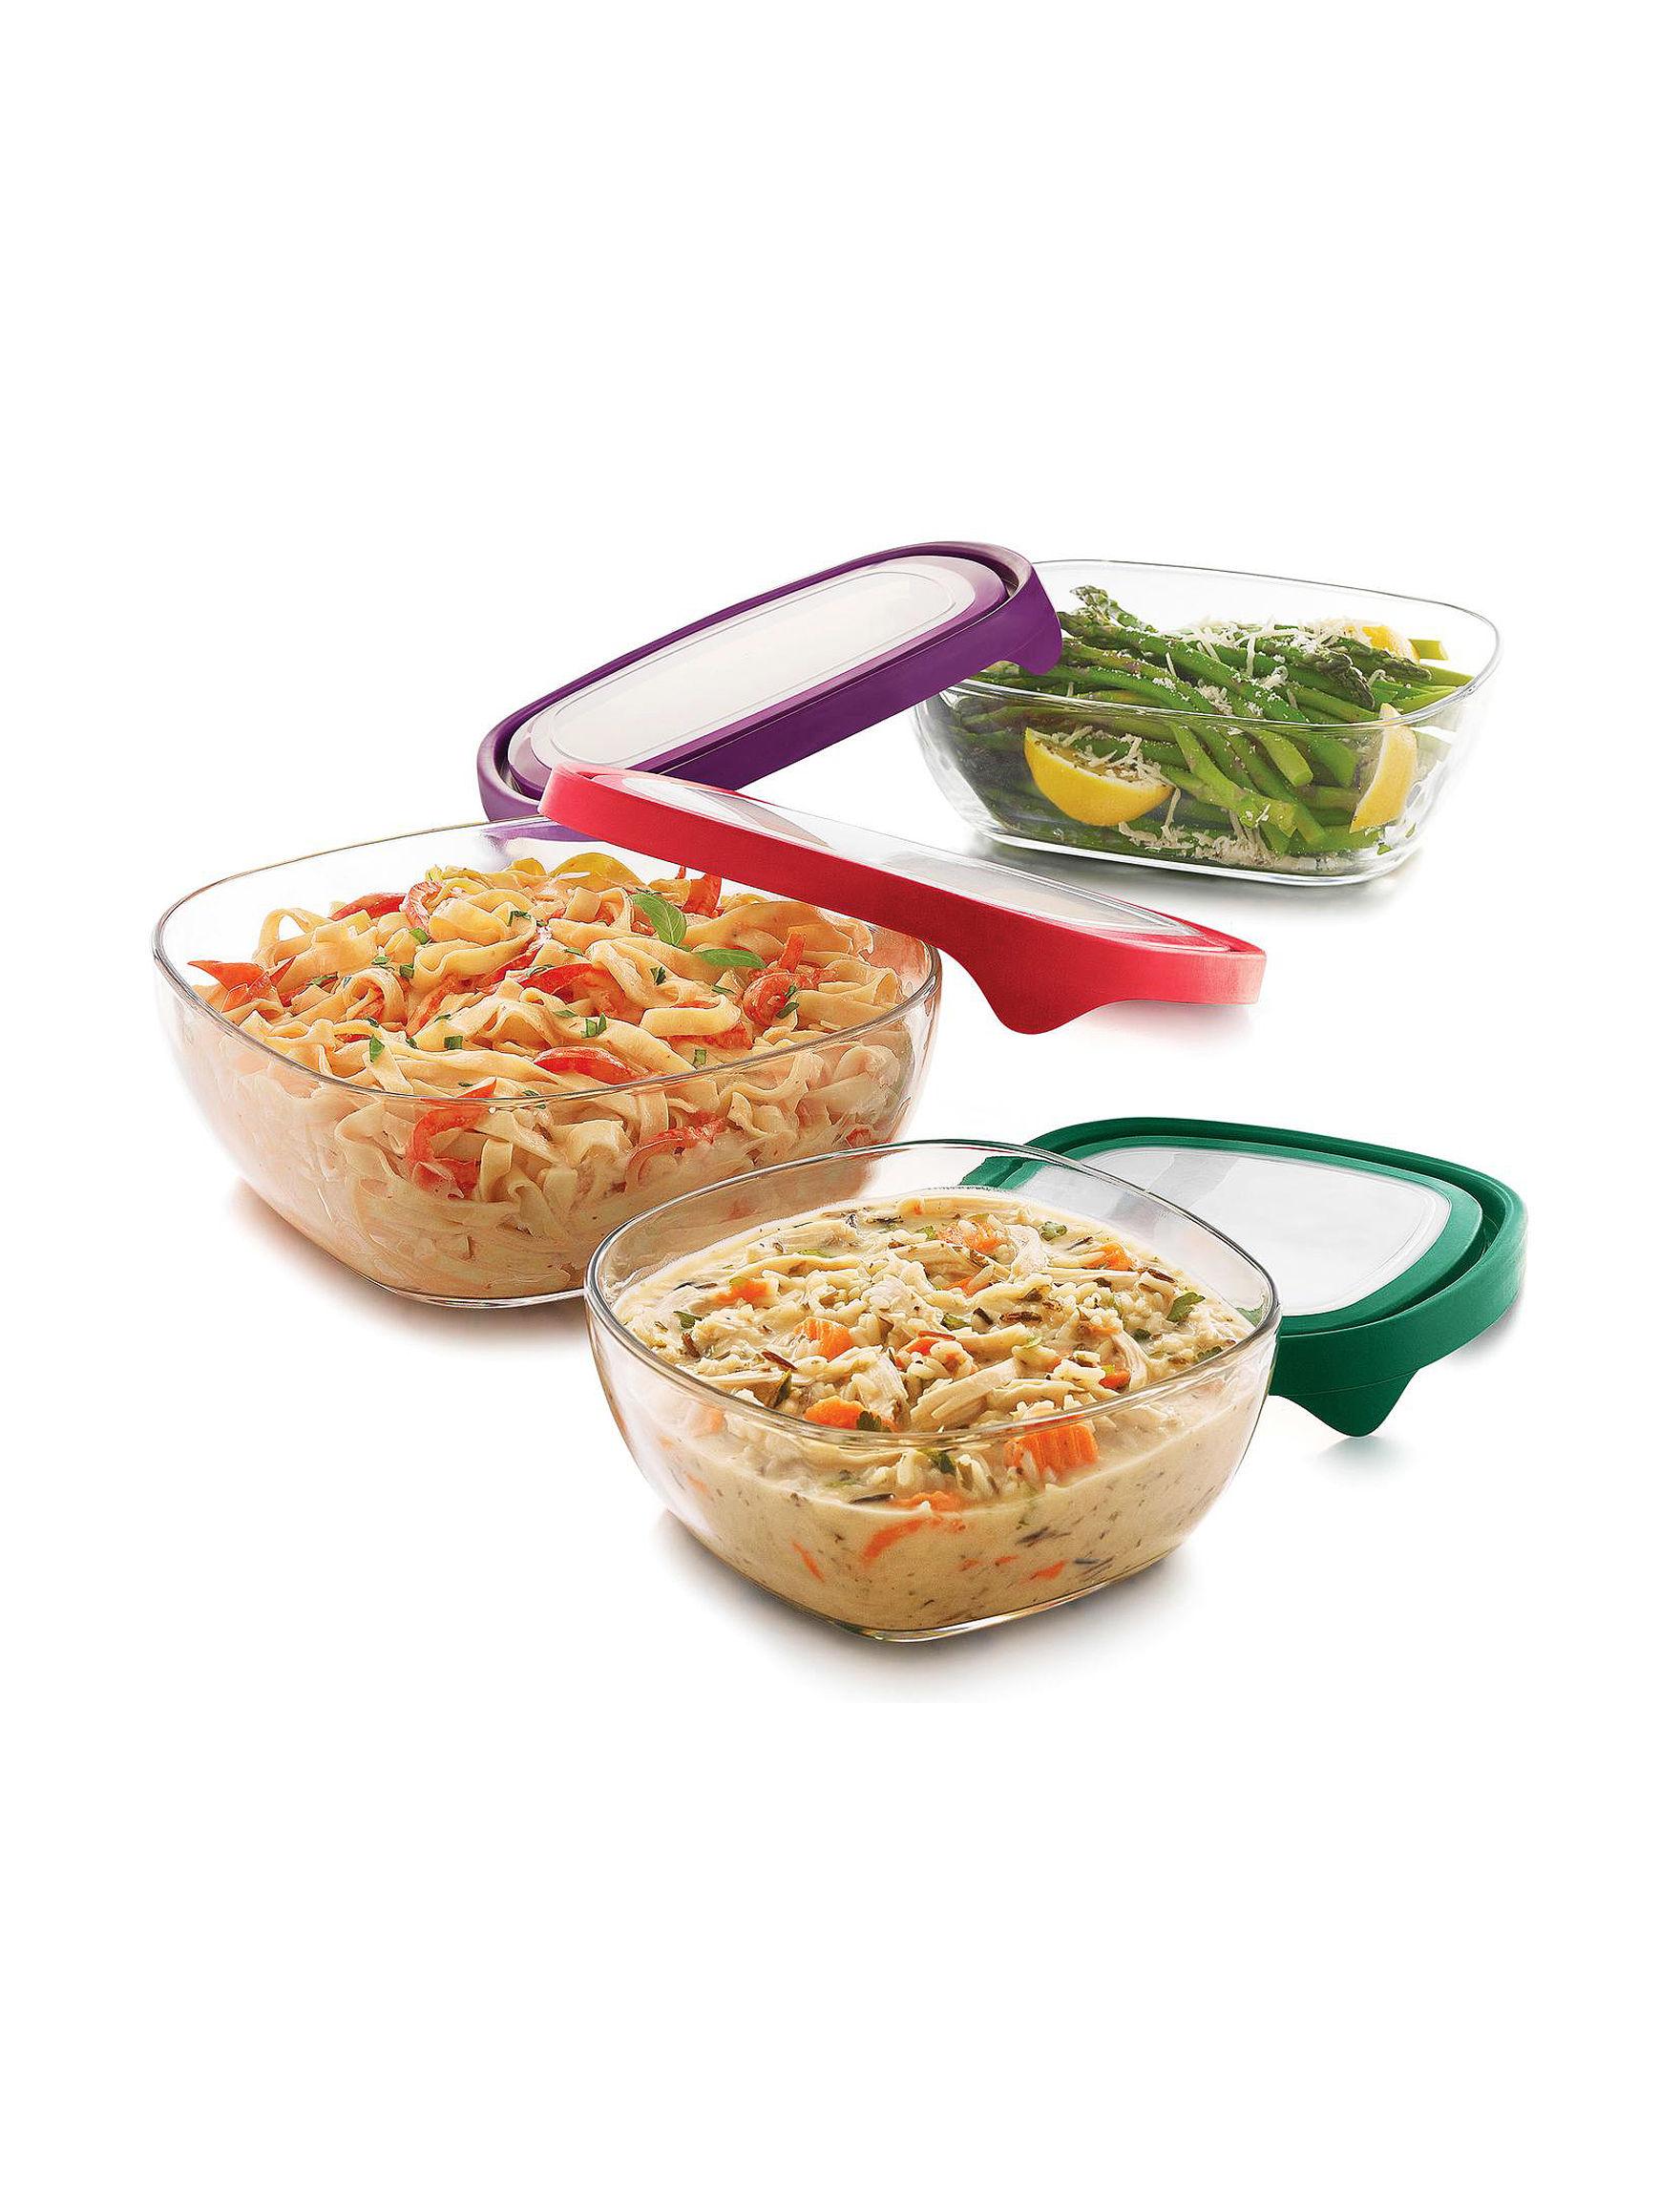 Libbey Glassware White / Multi Mixing Bowls Prep & Tools